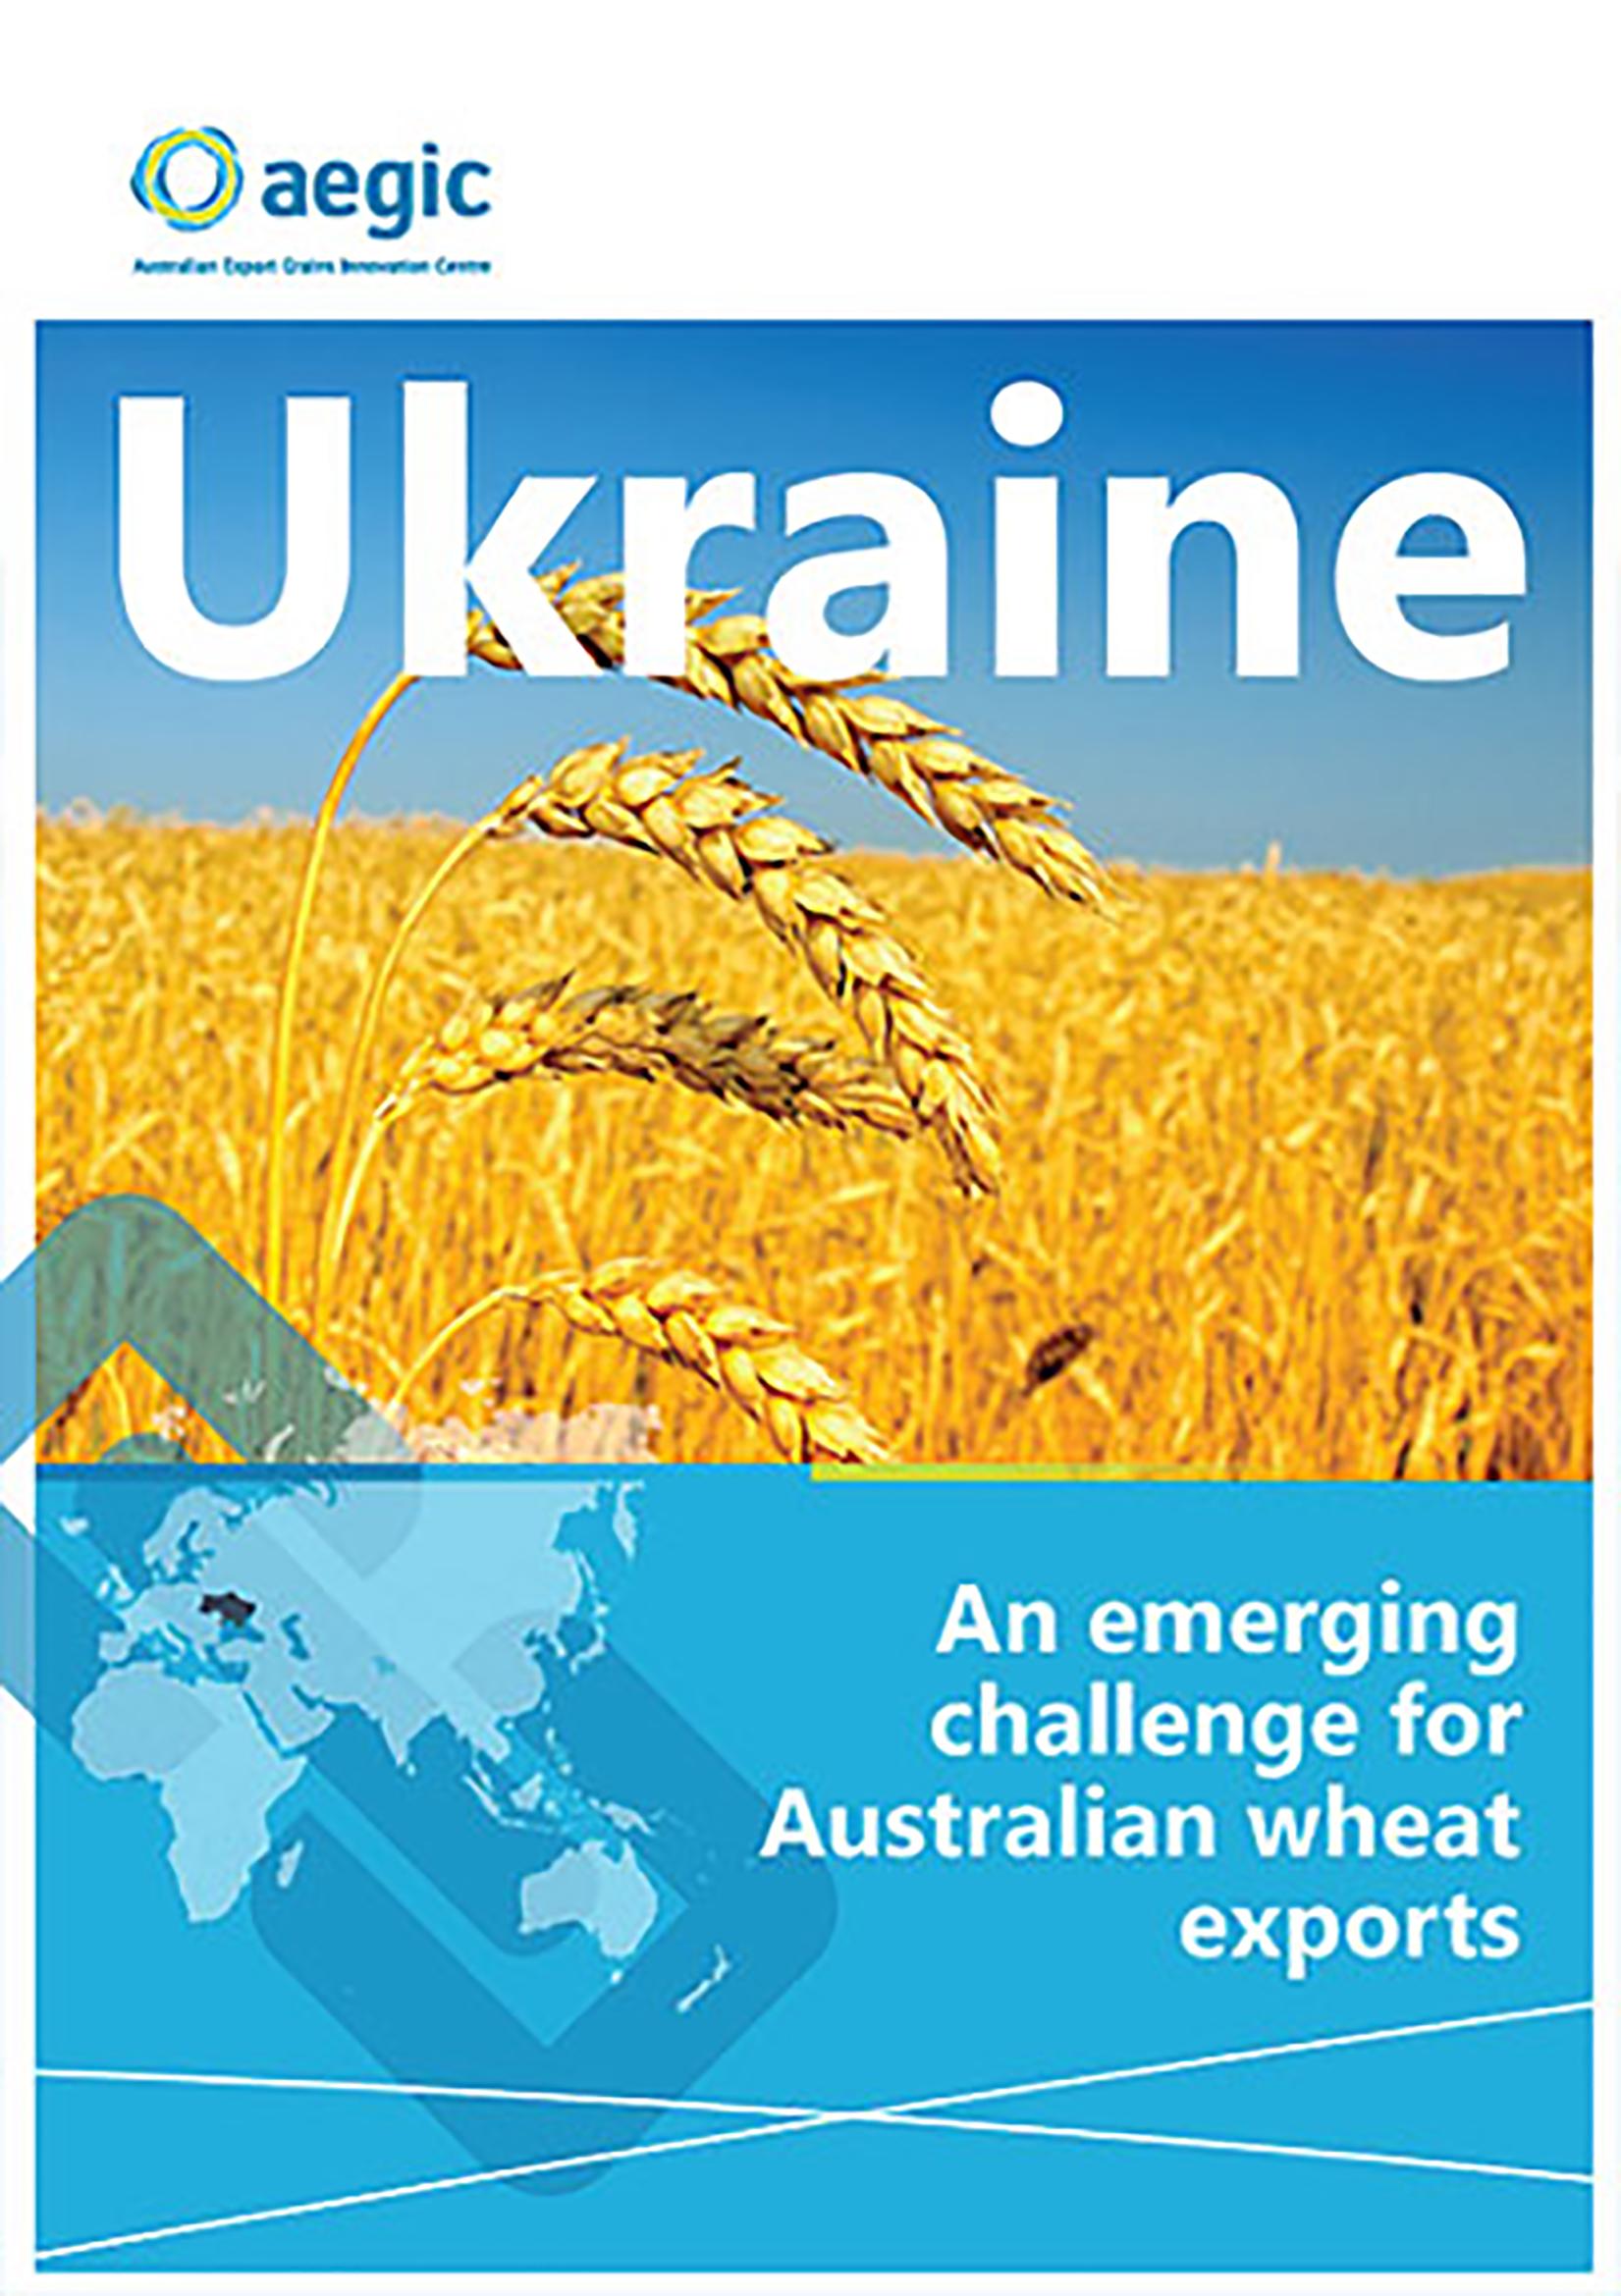 Ukraine - An emerging challenge for Australian wheat exports (2016)